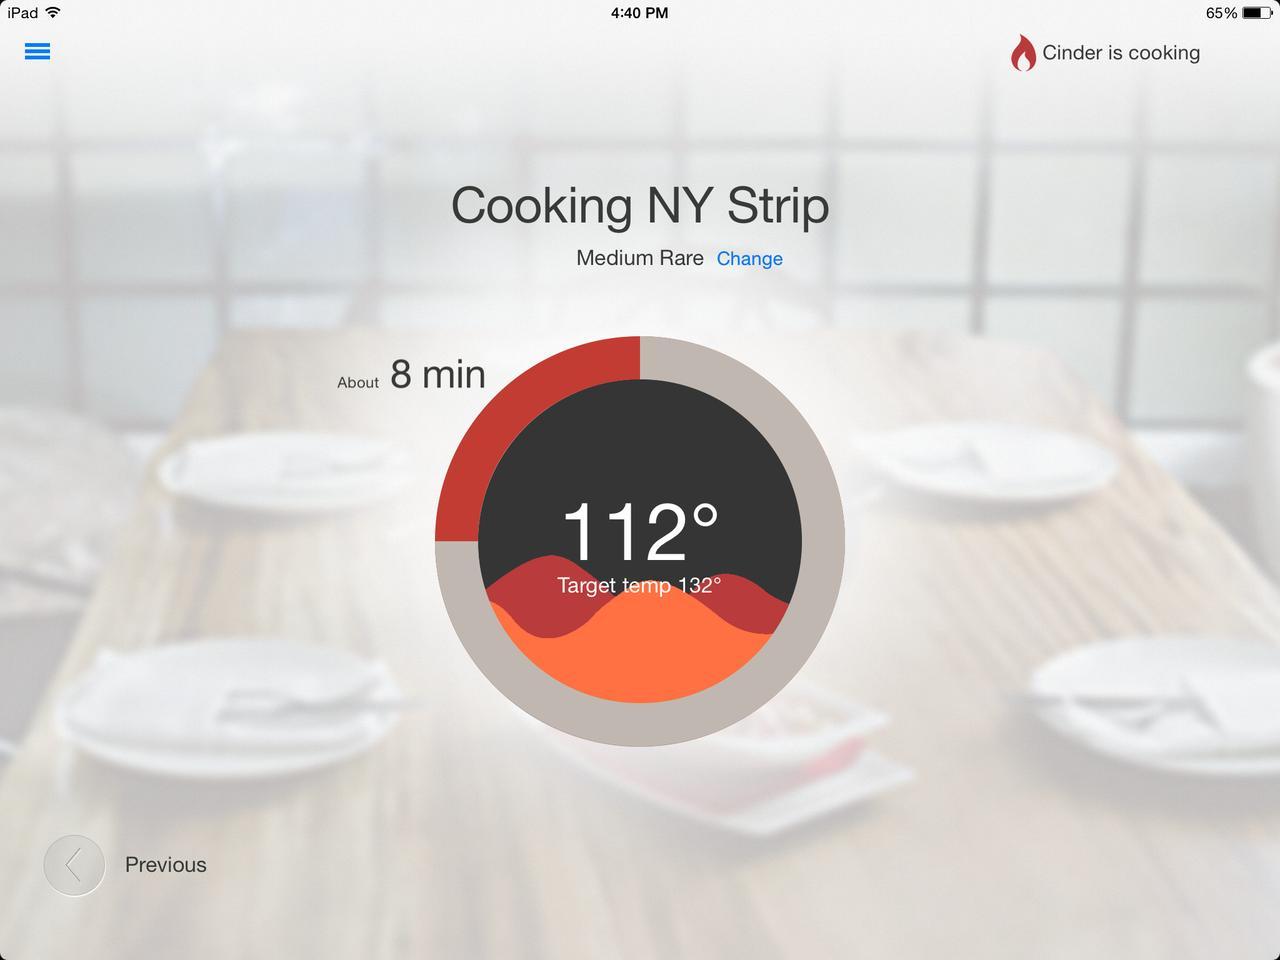 The Cinder Sensing Cooker app showing cooking temperature status